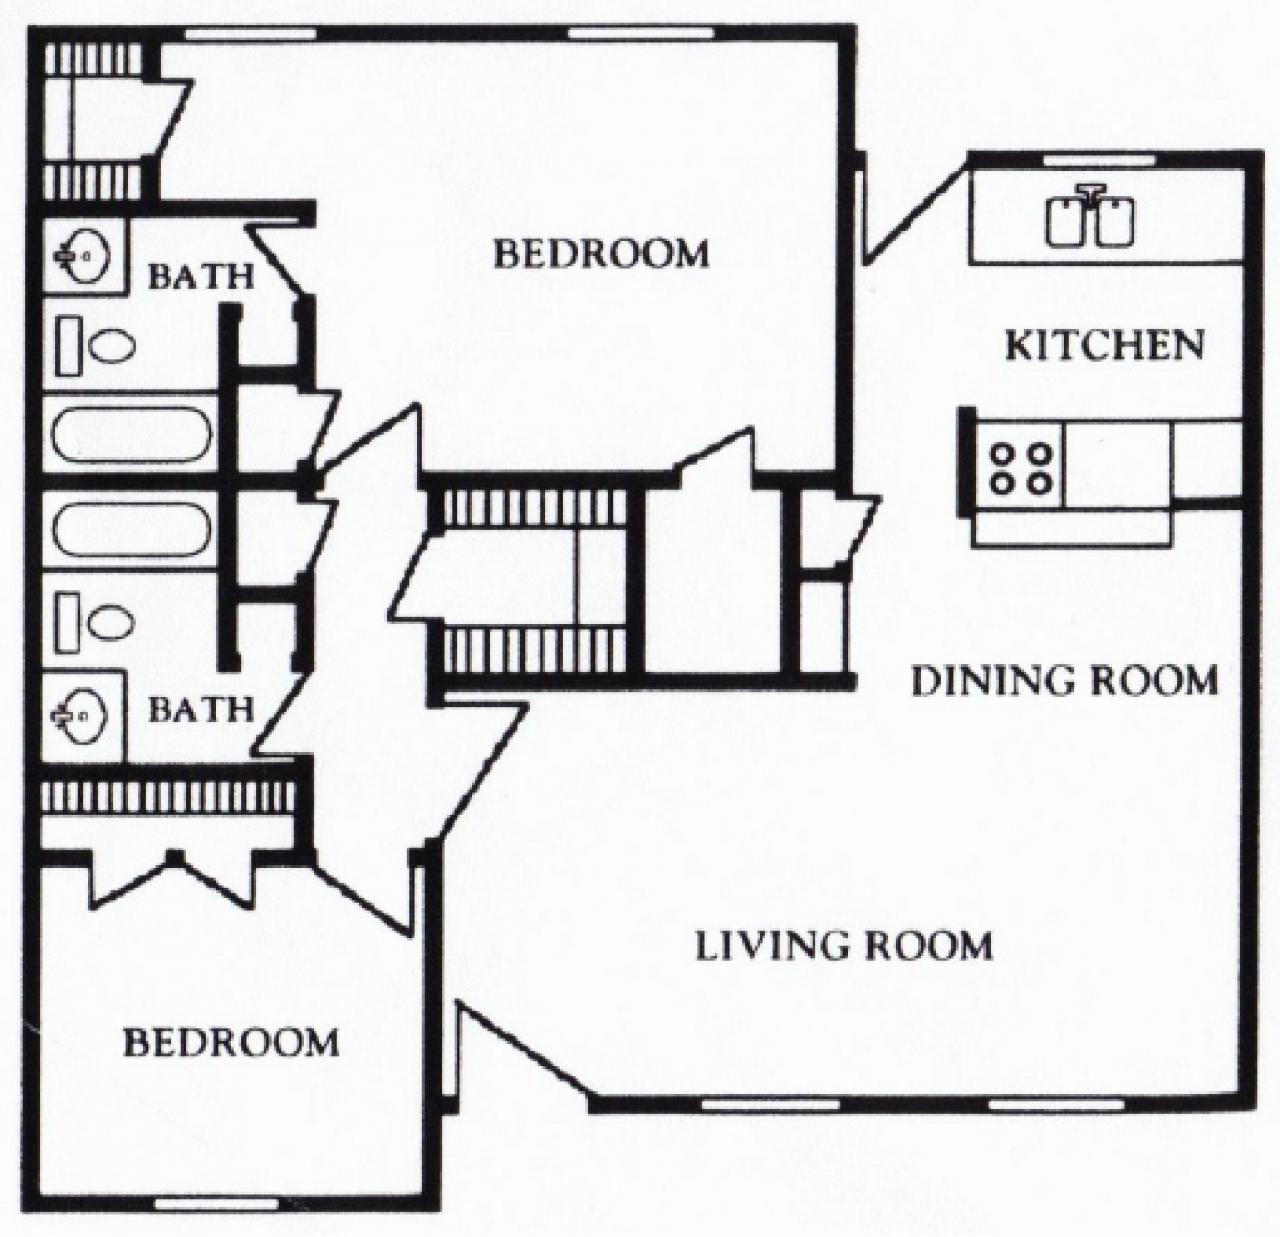 Mont Belvieu Floor Plan 2 bed 2 bath 1180 sq ft